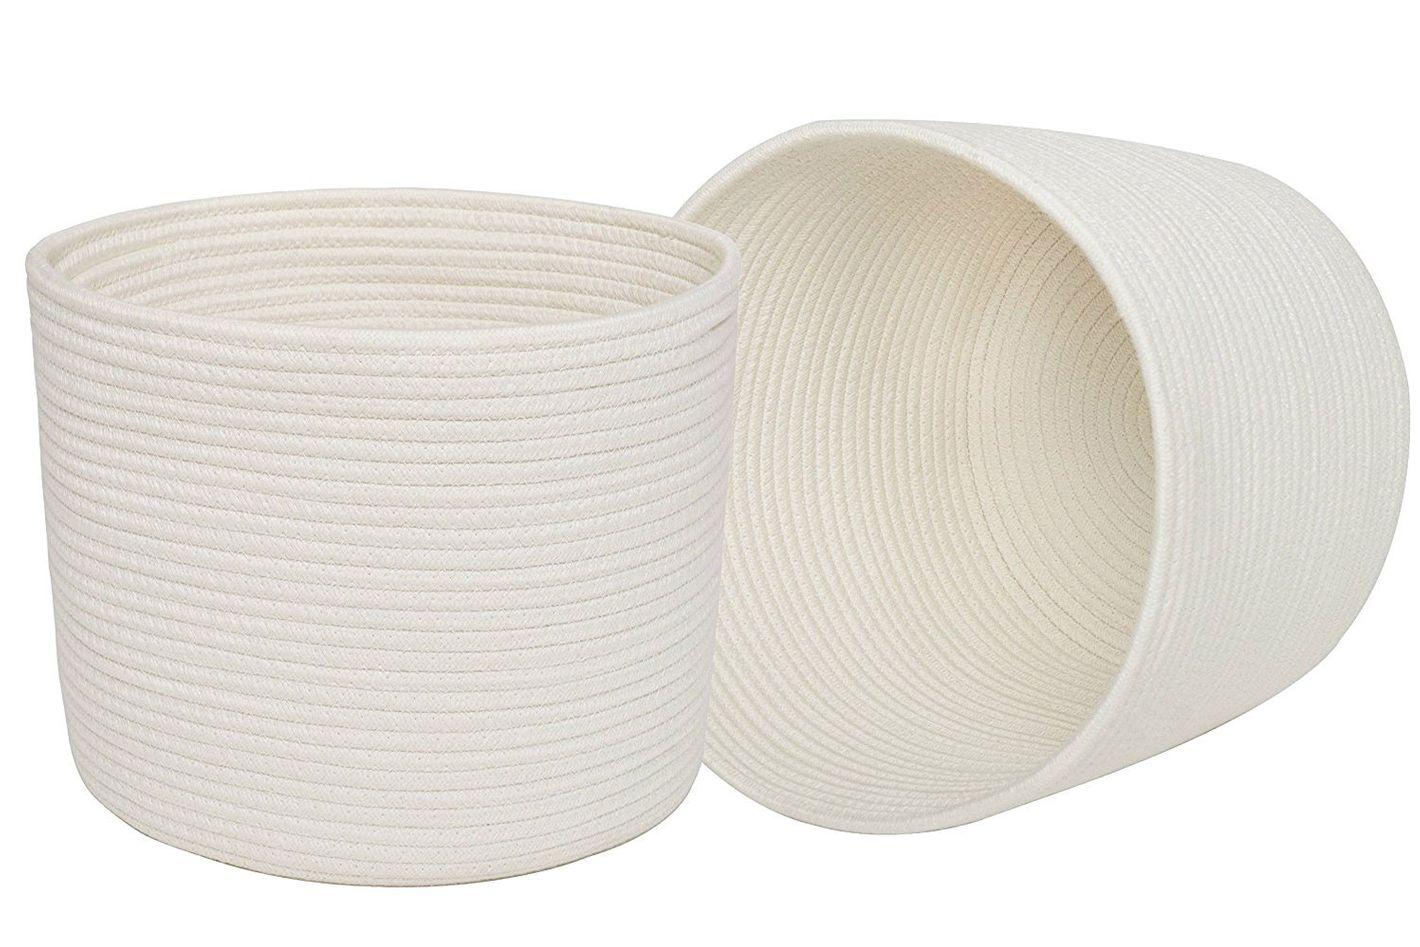 La Jolie Muse Large Cotton Rope Storage Basket